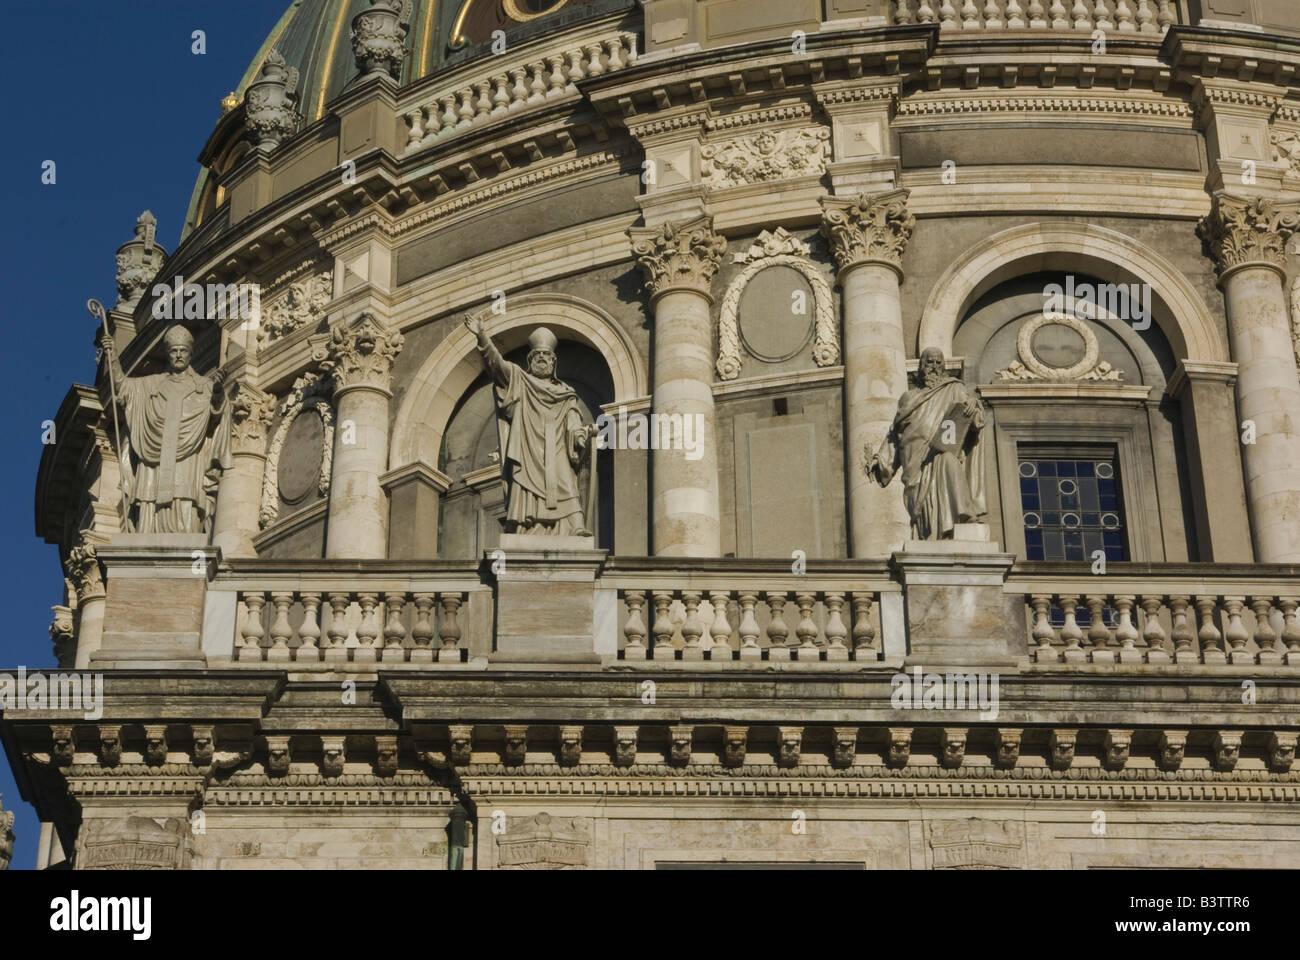 Europe, Denmark, Copenhagen, Frederik's Church, known as the Marble Church - Stock Image